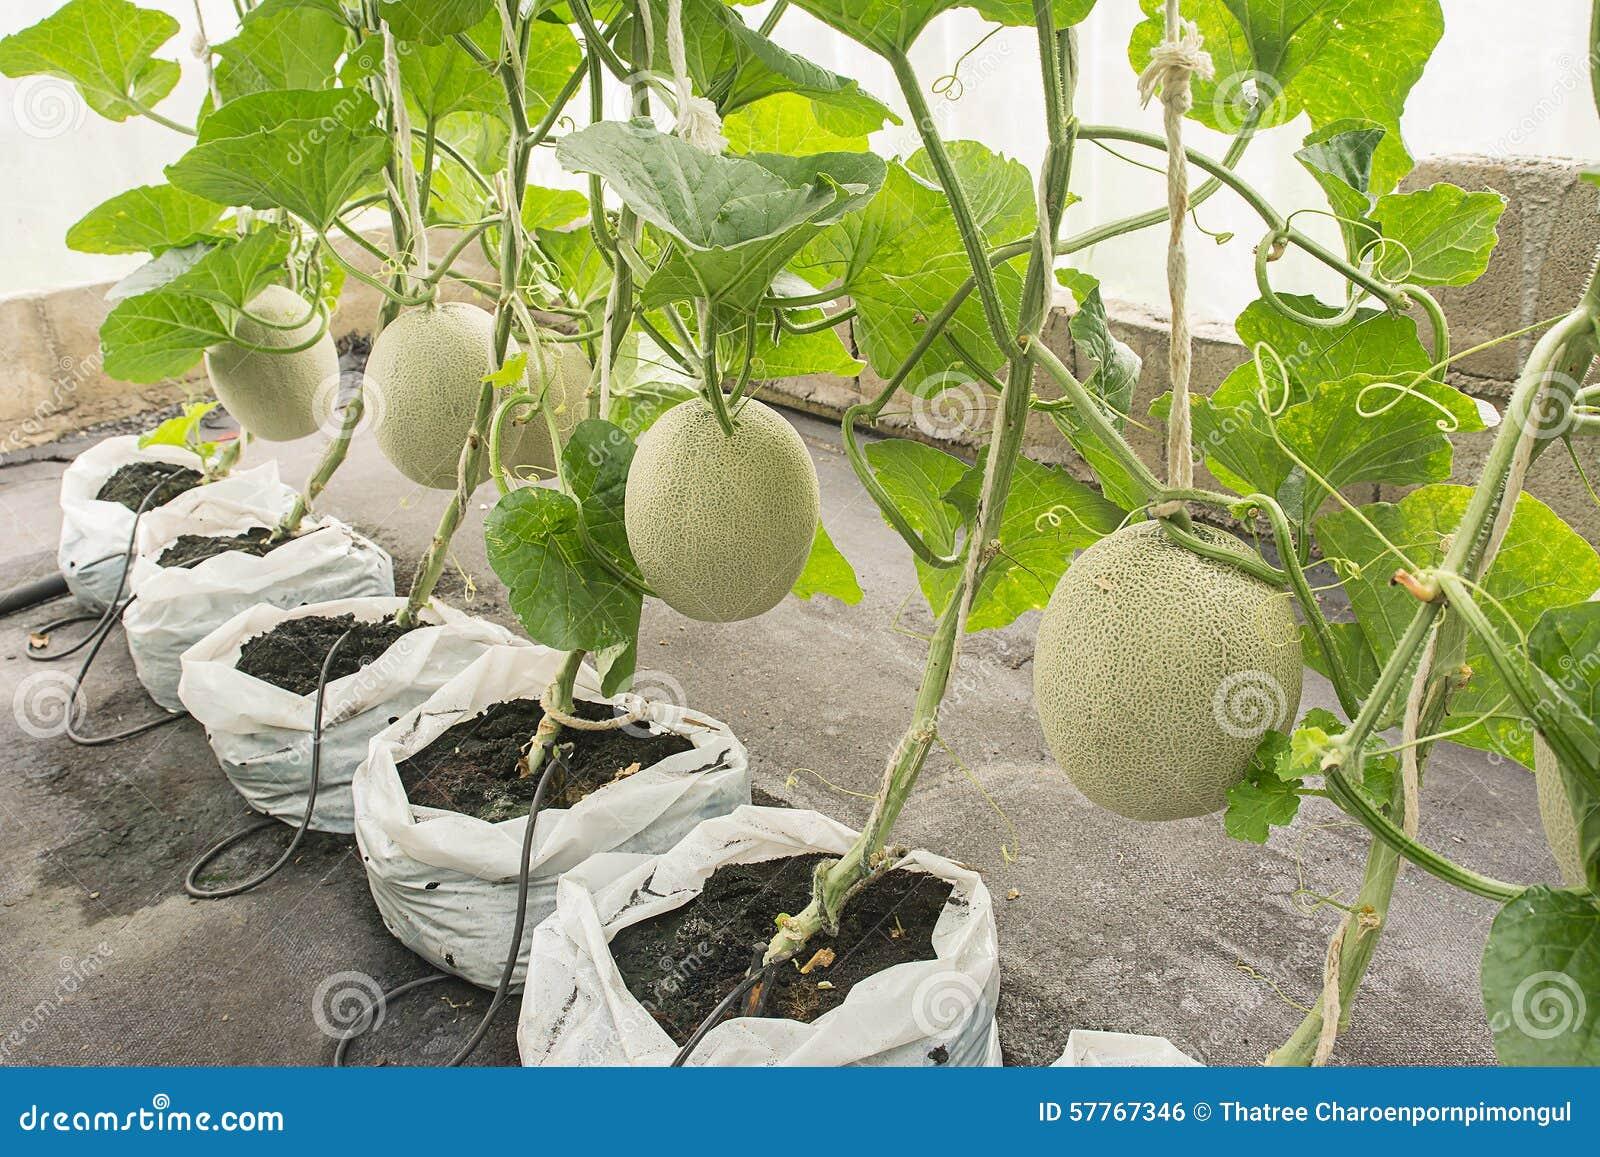 When to plant a melon